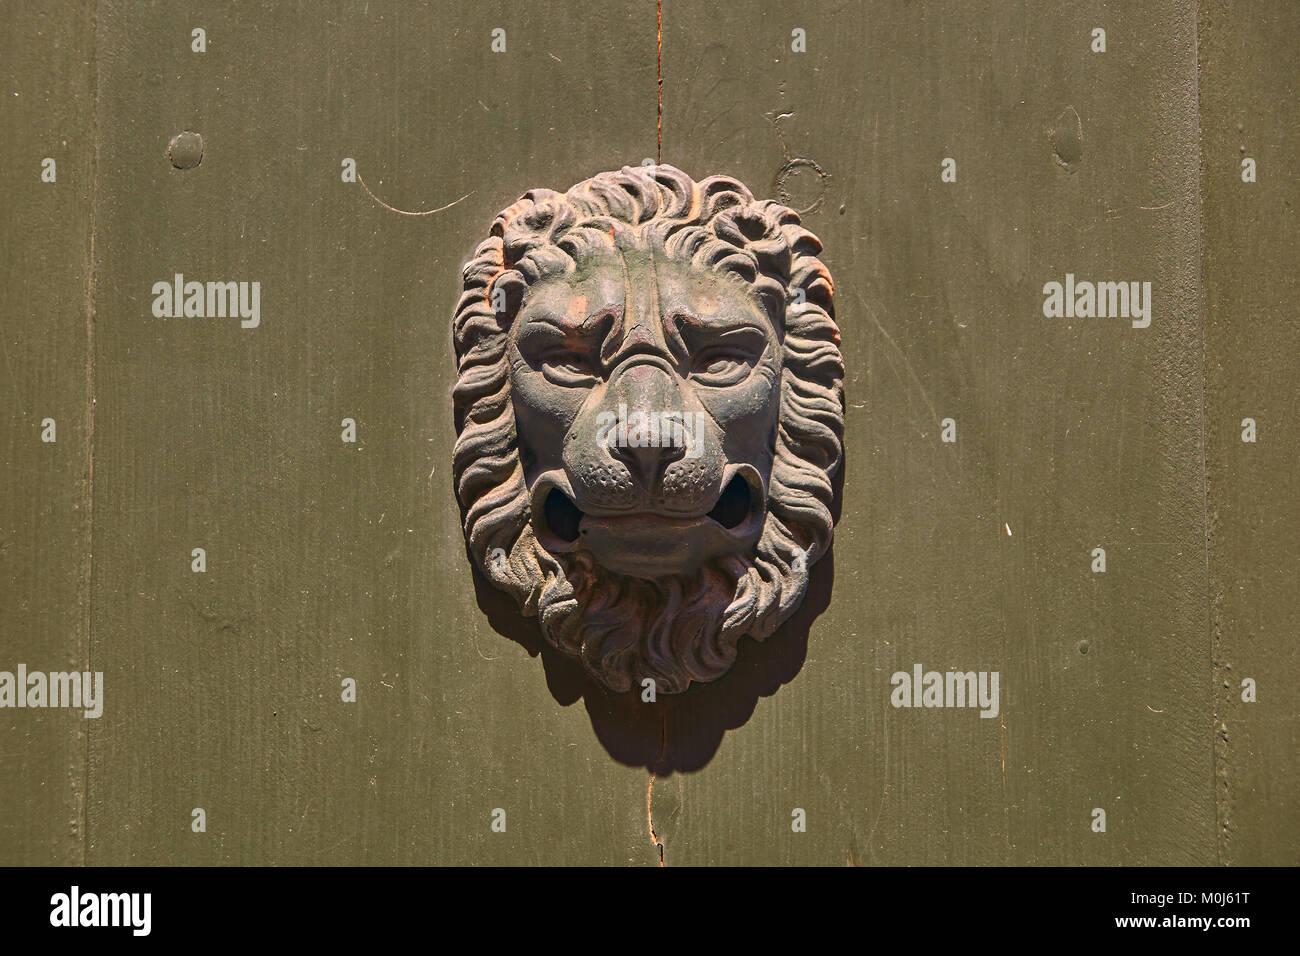 Vintage Door Knocker In The Shape Of Lion Head